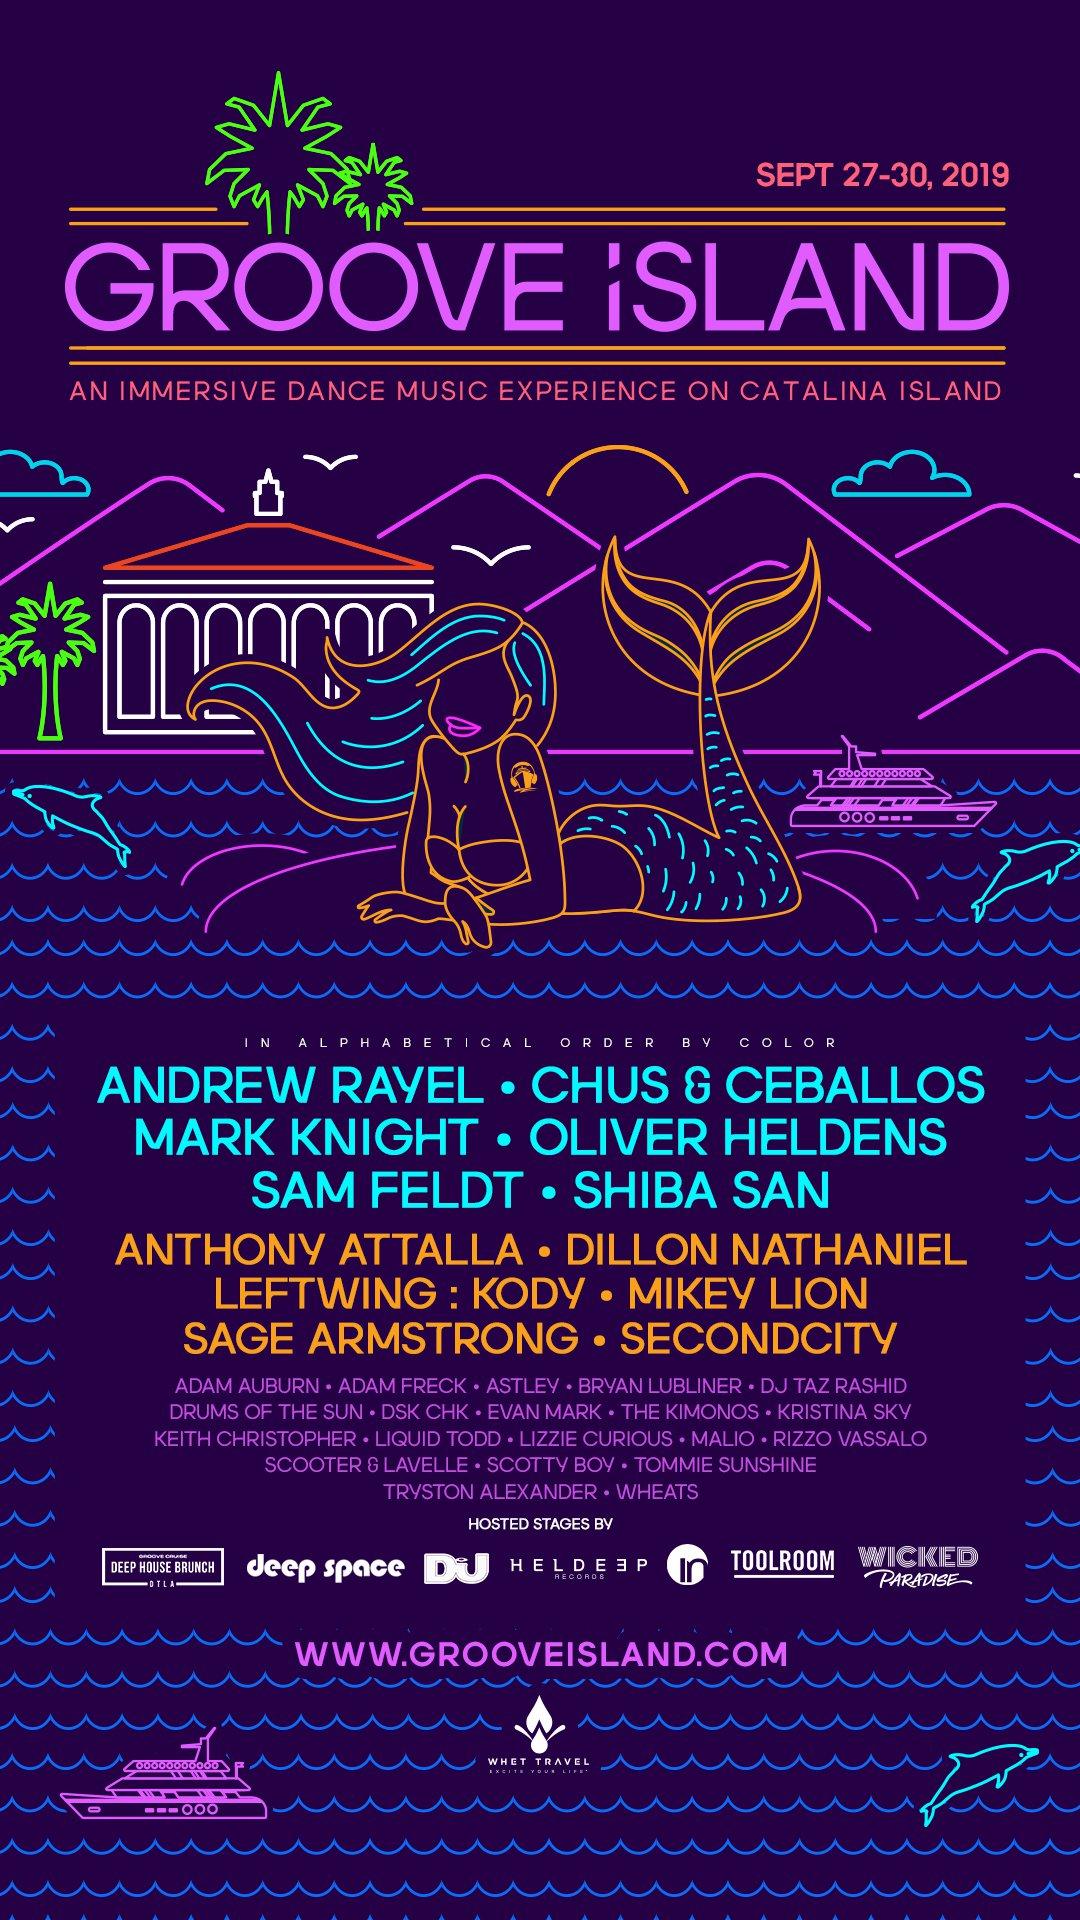 Groove Island 2019 Lineup